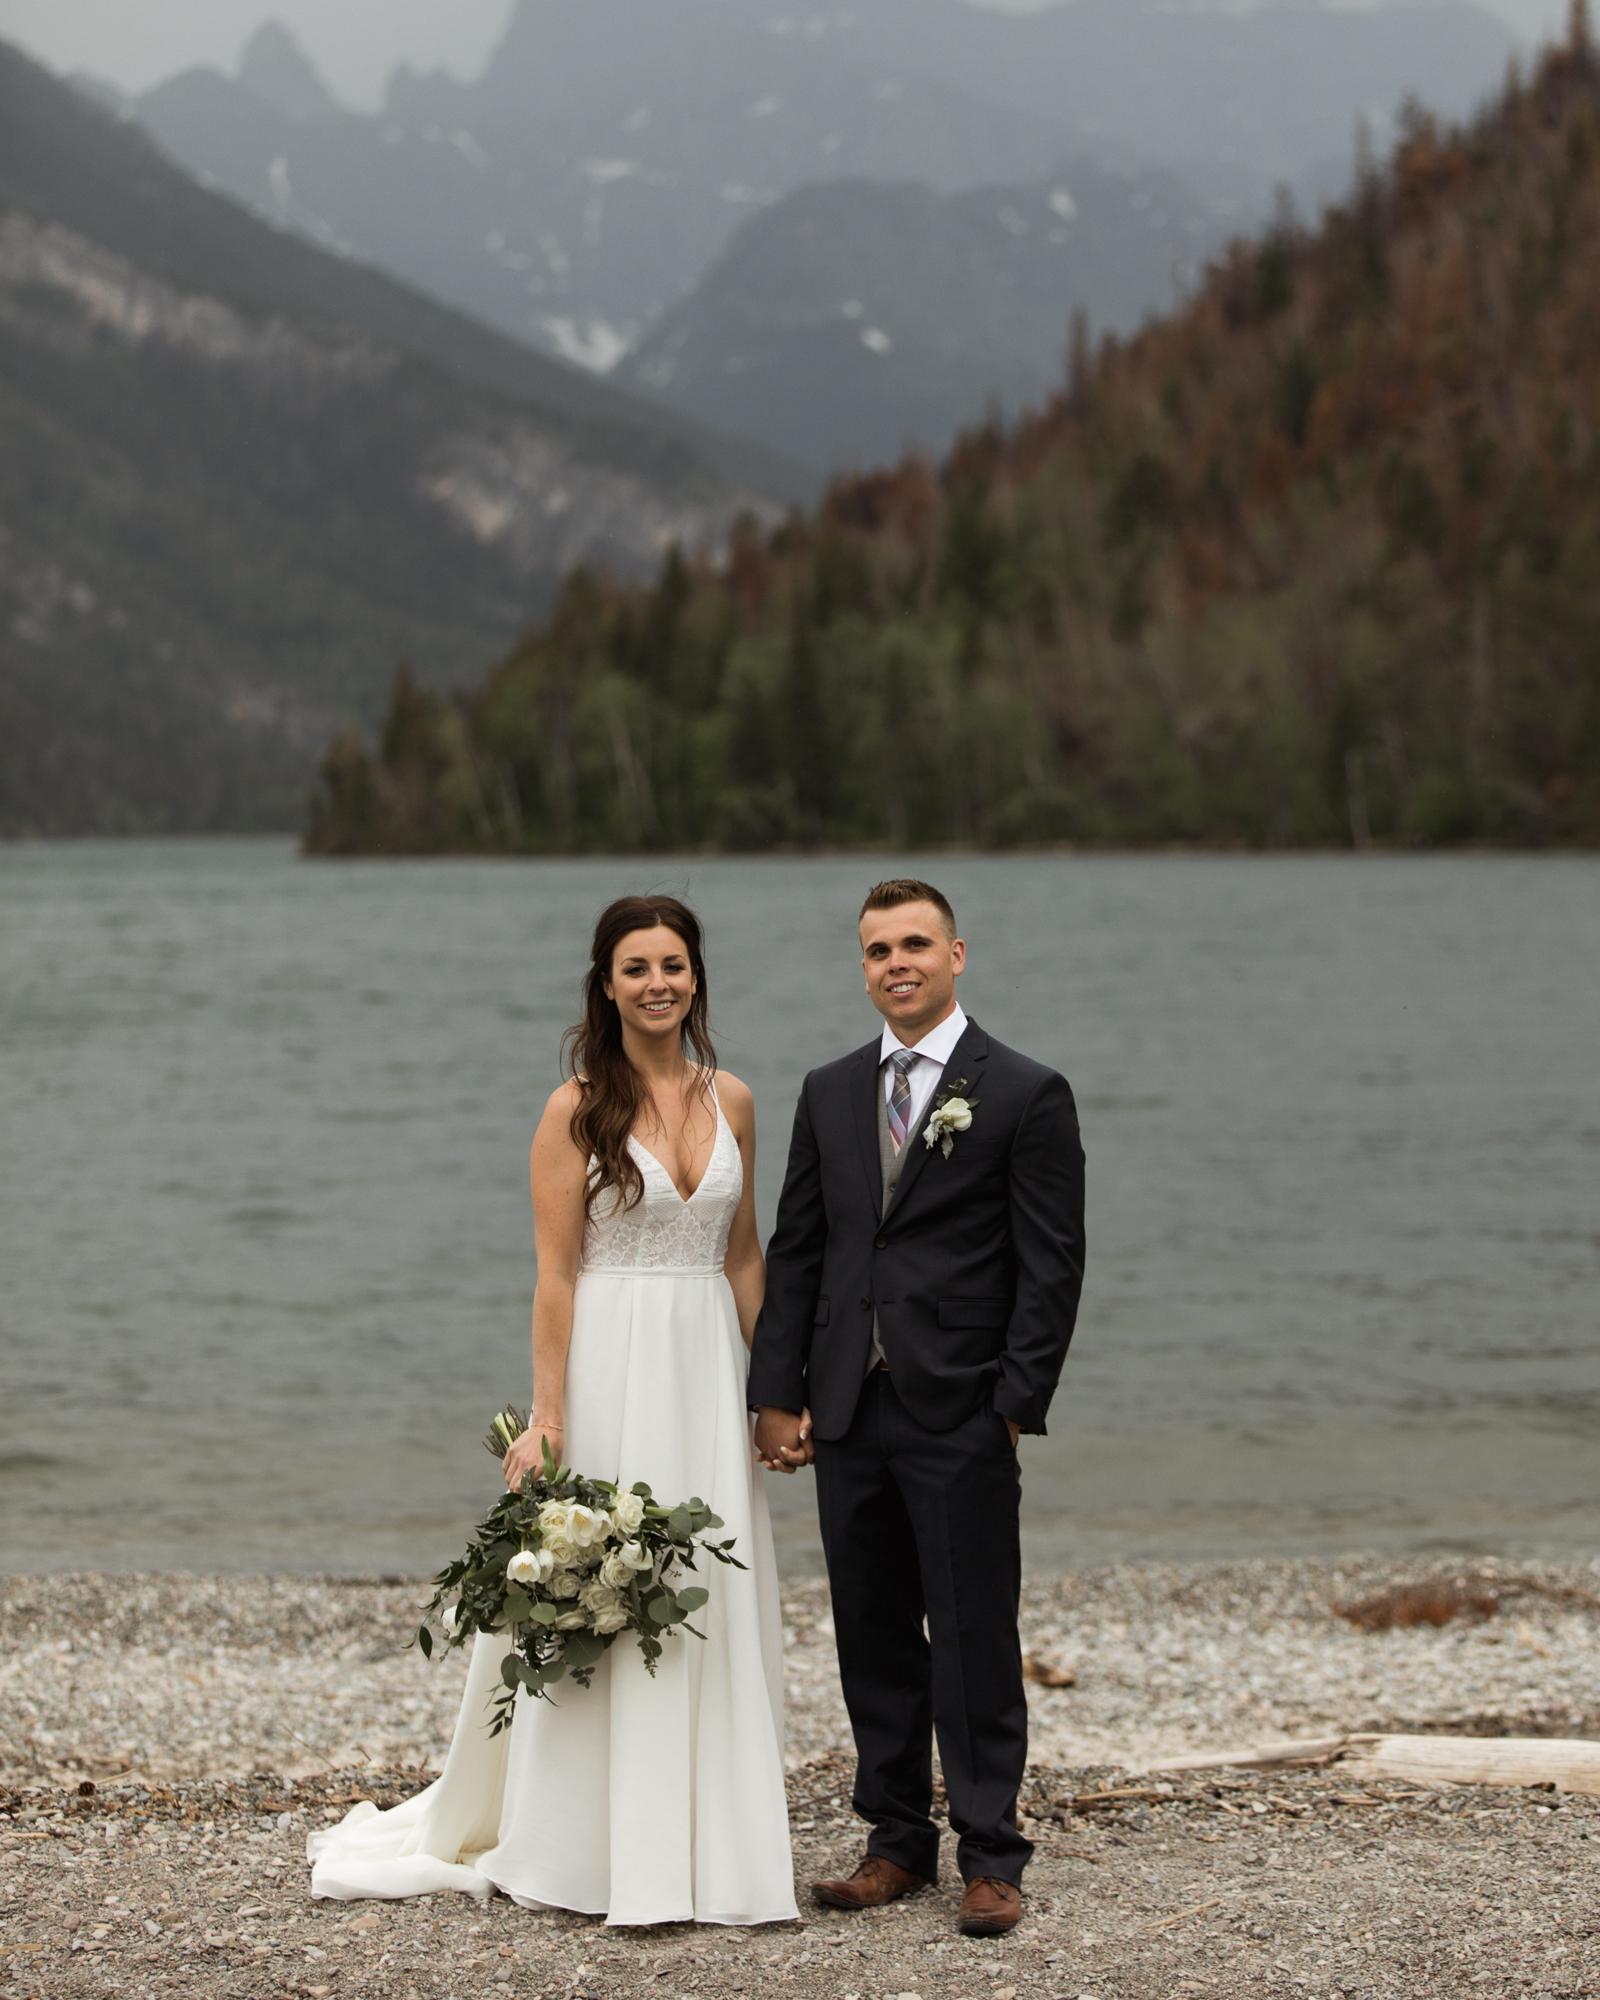 Waterton wedding photographer portraits